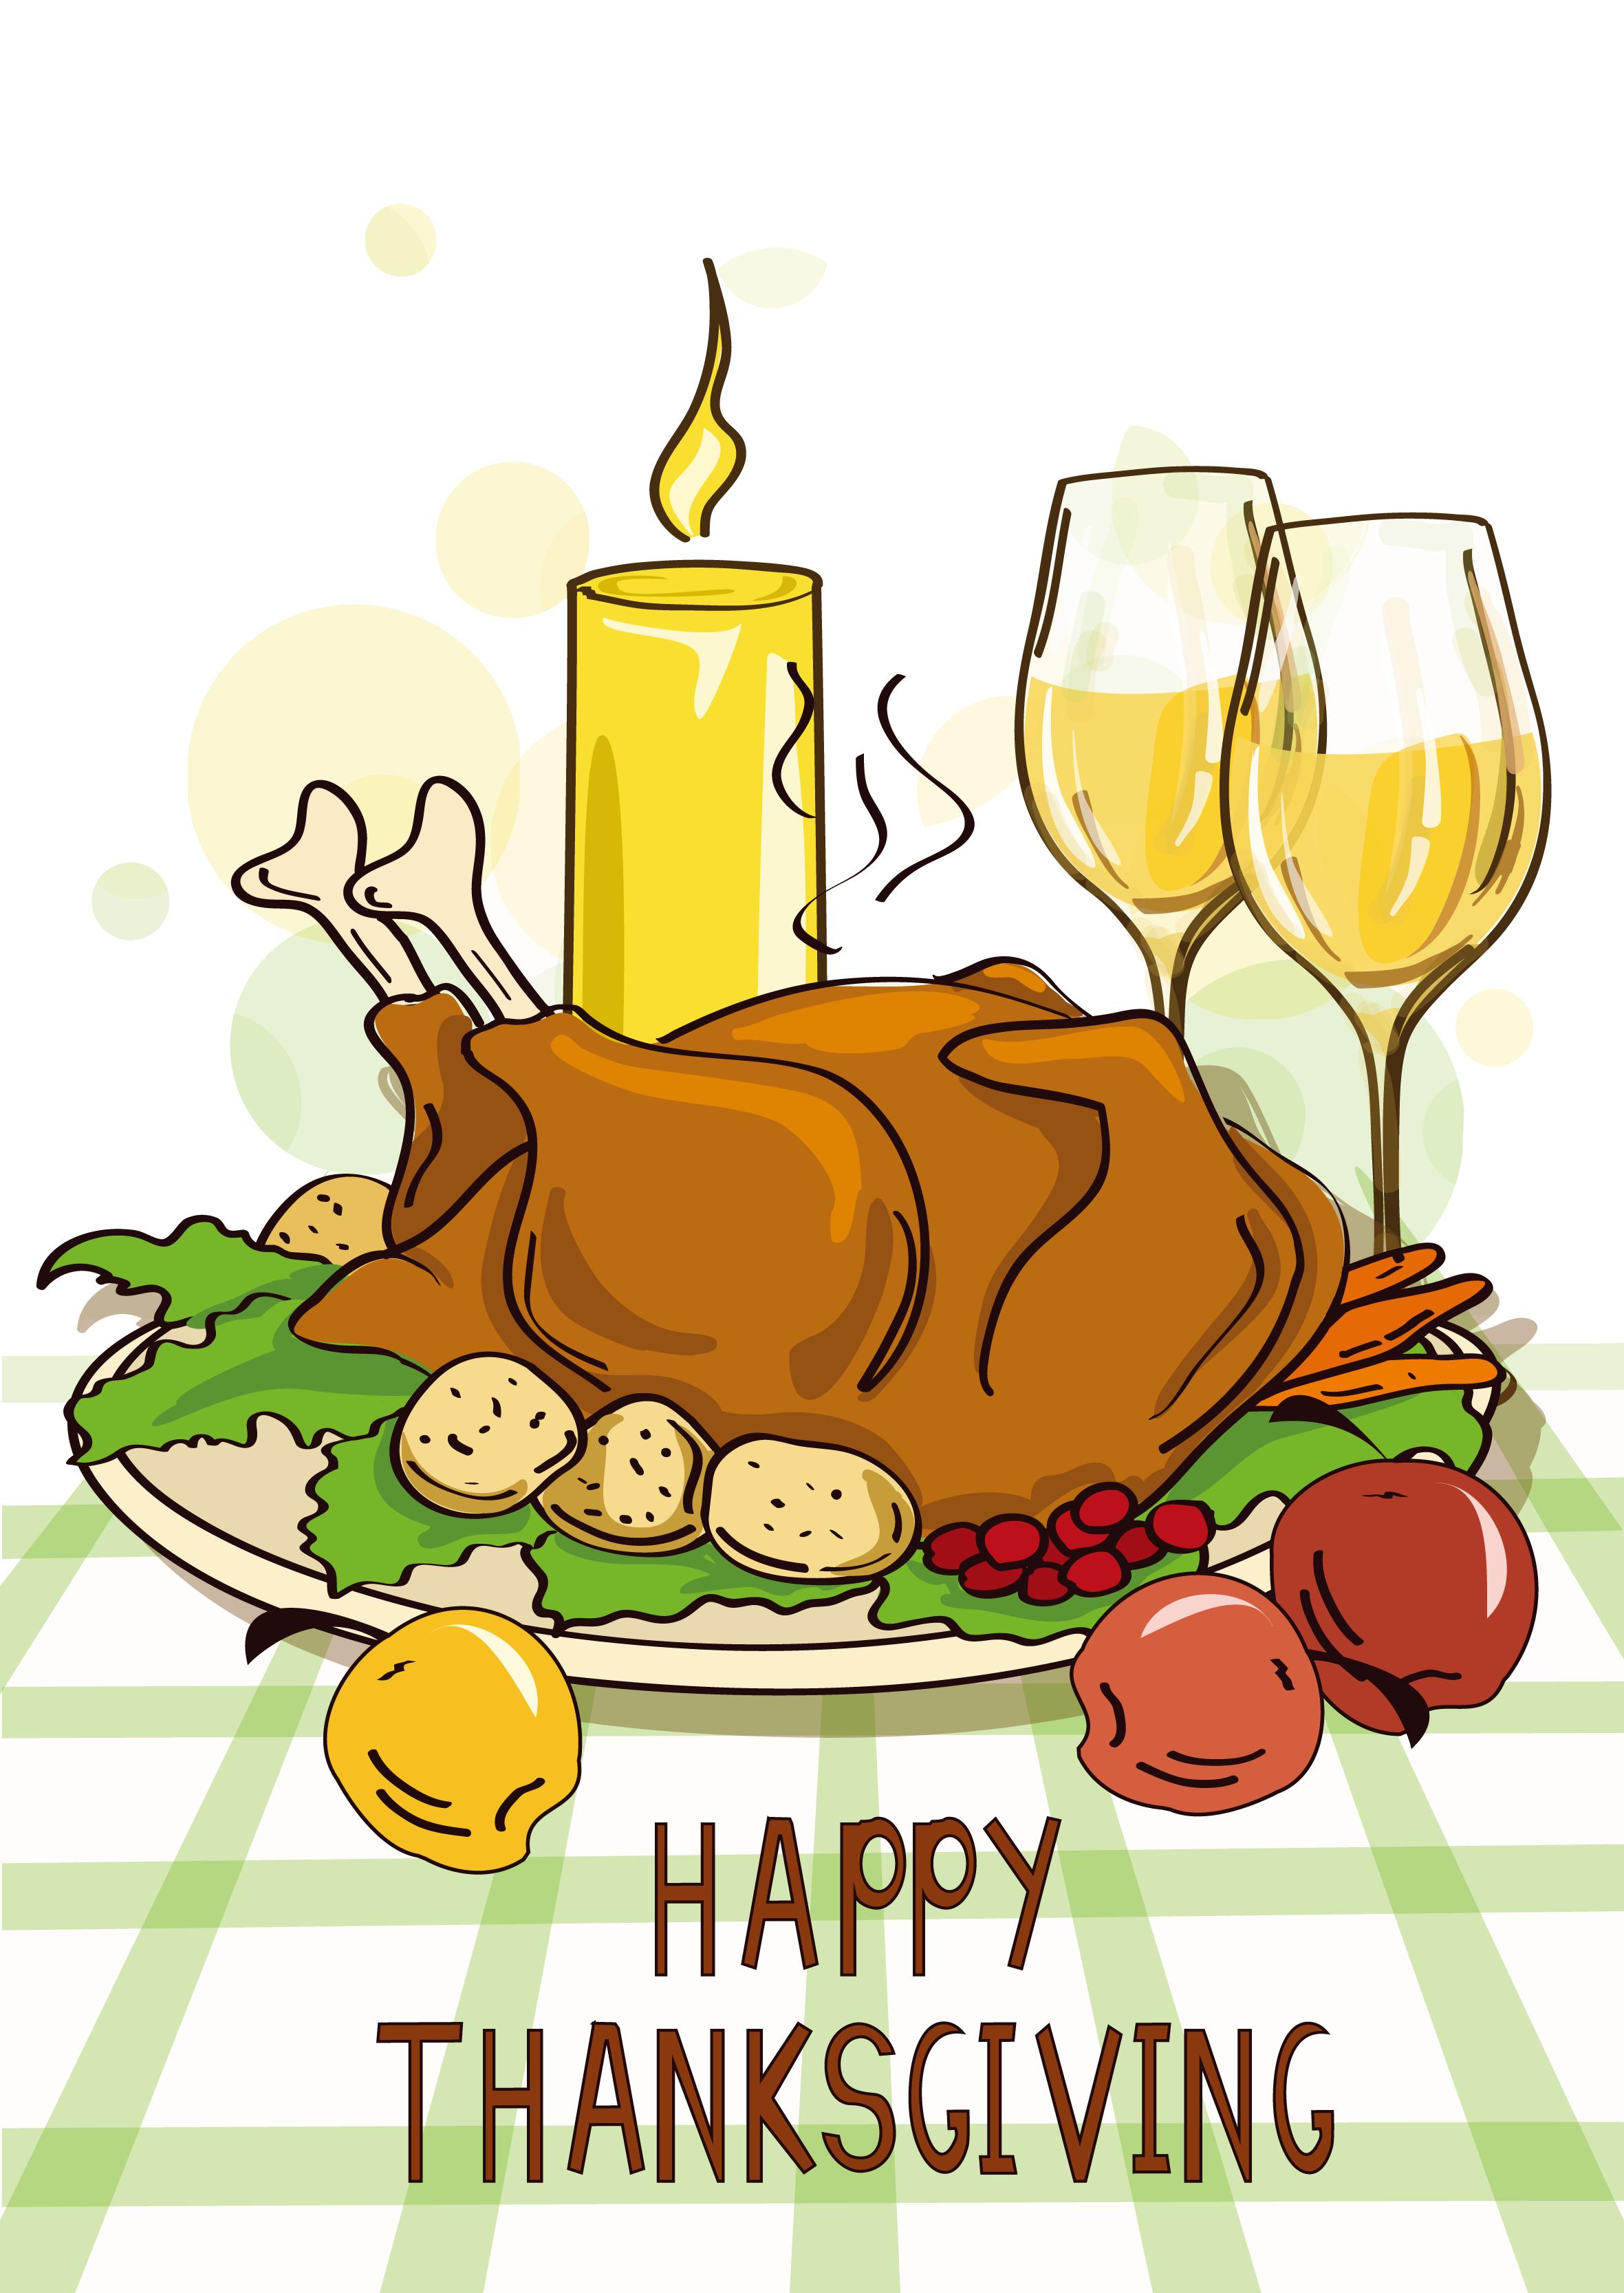 Turkey meat dinner cartoon. Clipart chicken thanksgiving